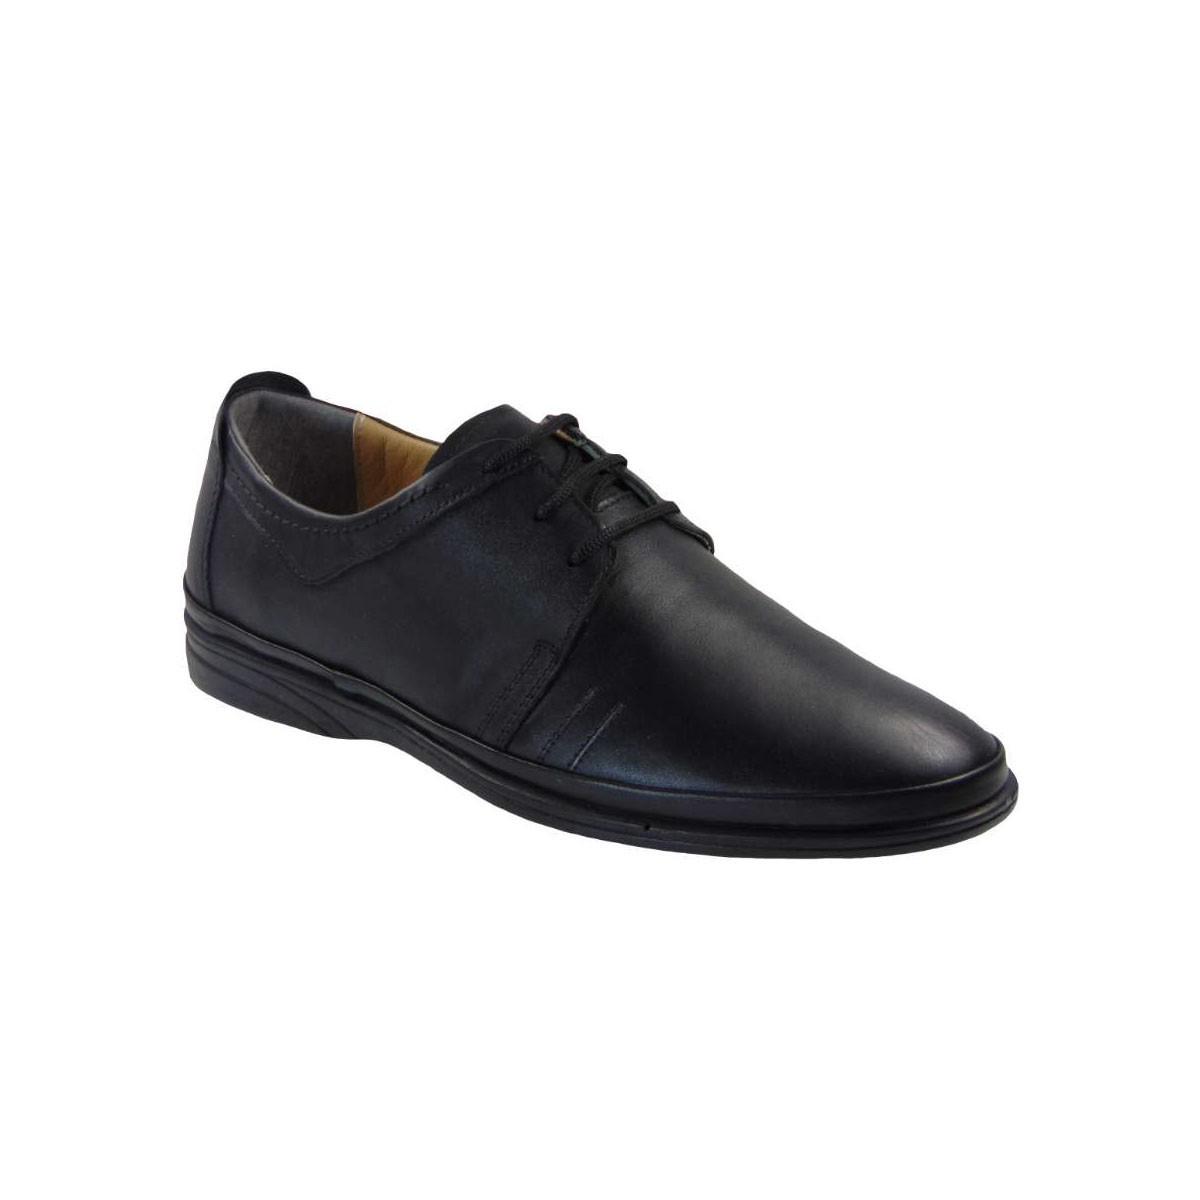 Tsimpolis Shoes 4180 Ανατομικό Δερμάτινο Δετό Μαύρο